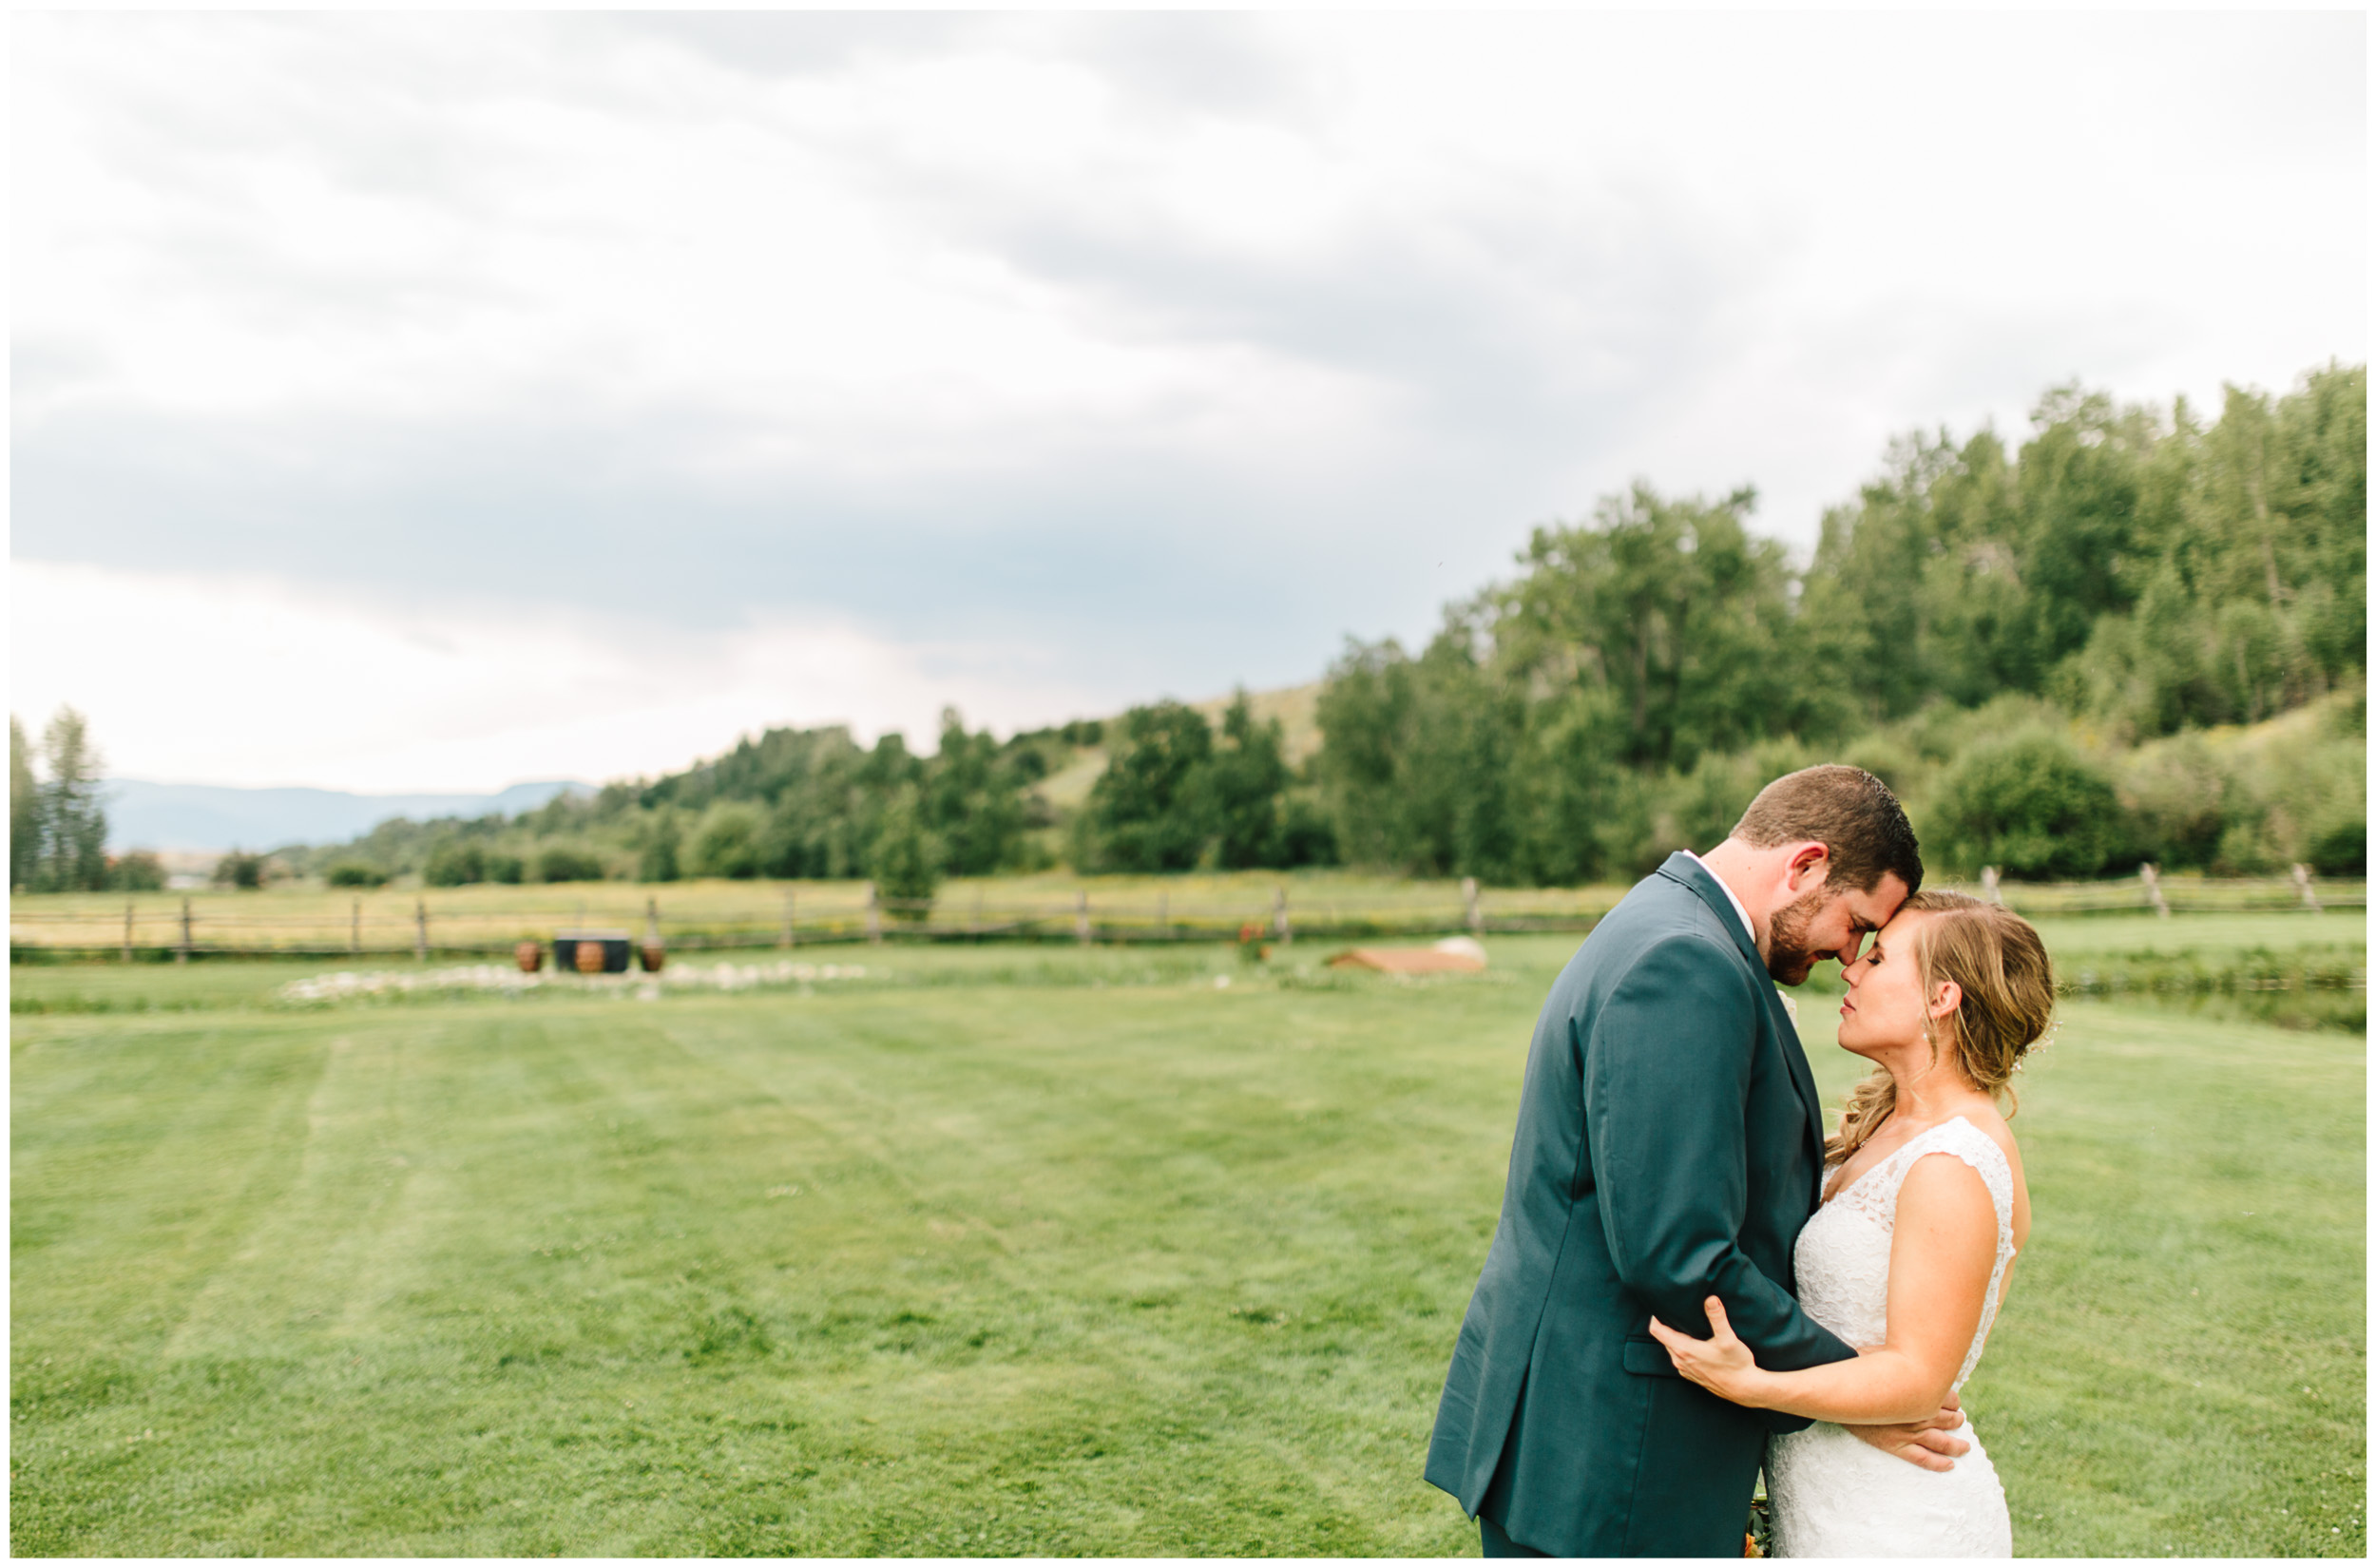 redlodge_montana_wedding_28a.jpg